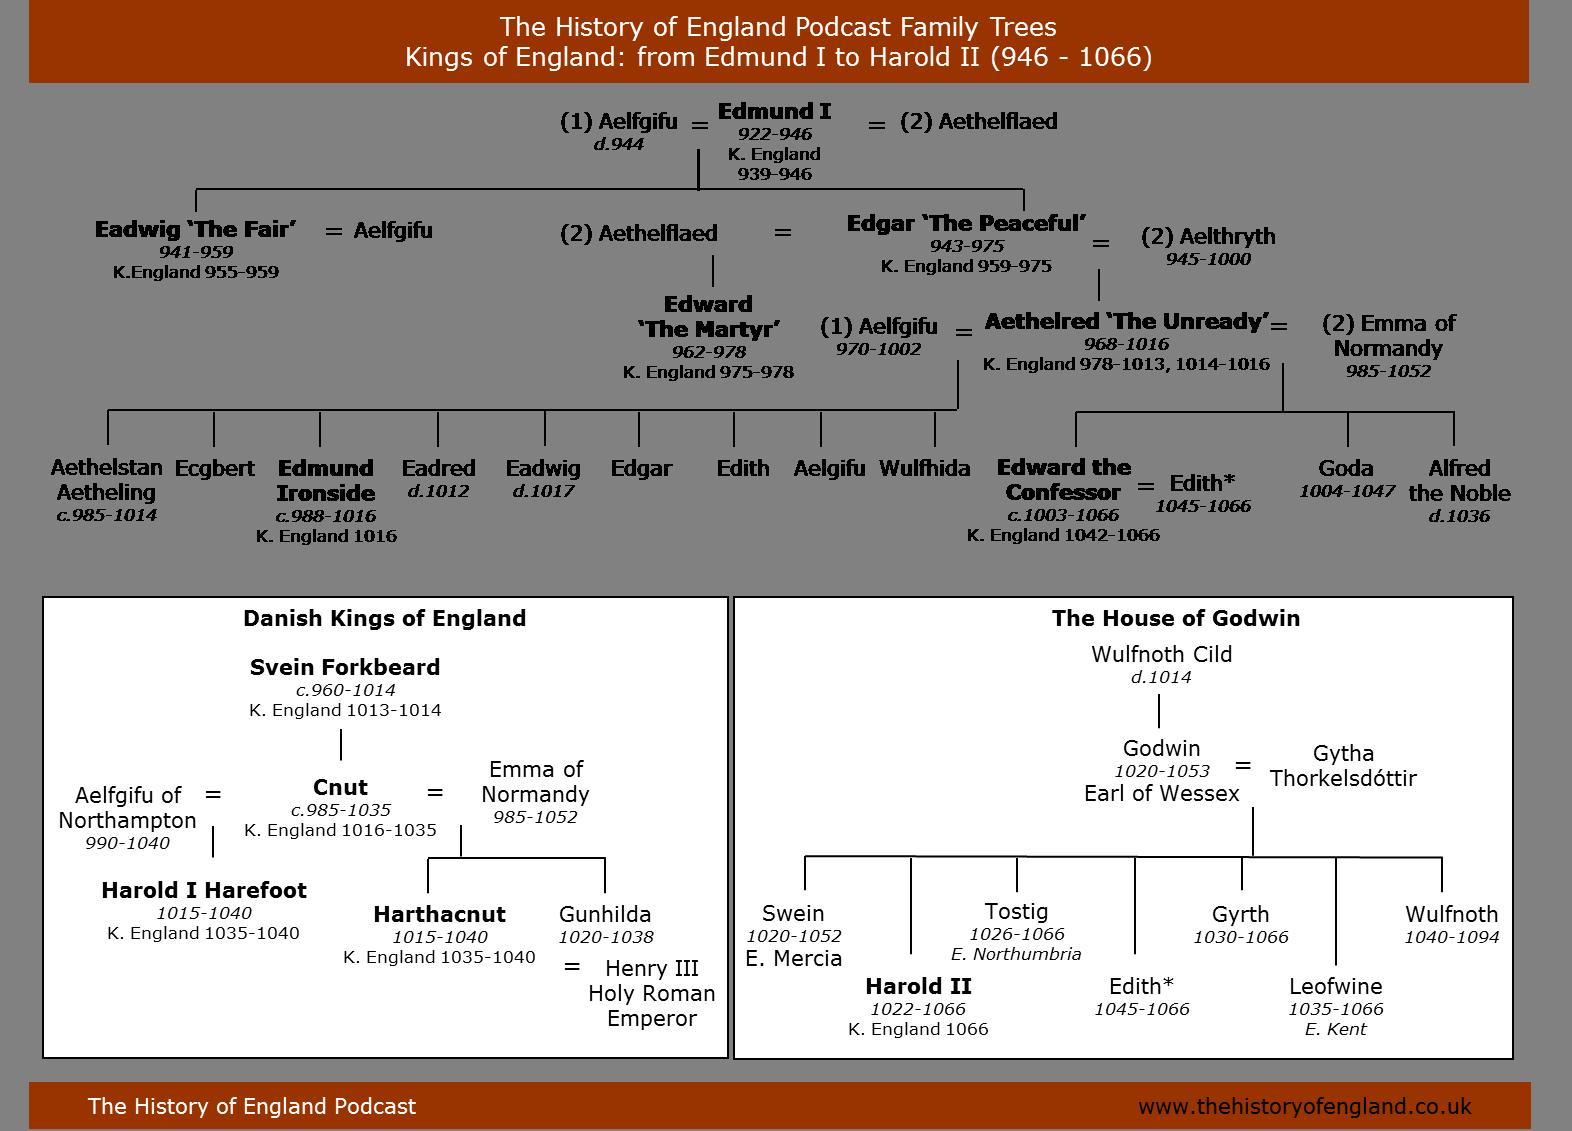 Edmun I to Harold II 946-1066